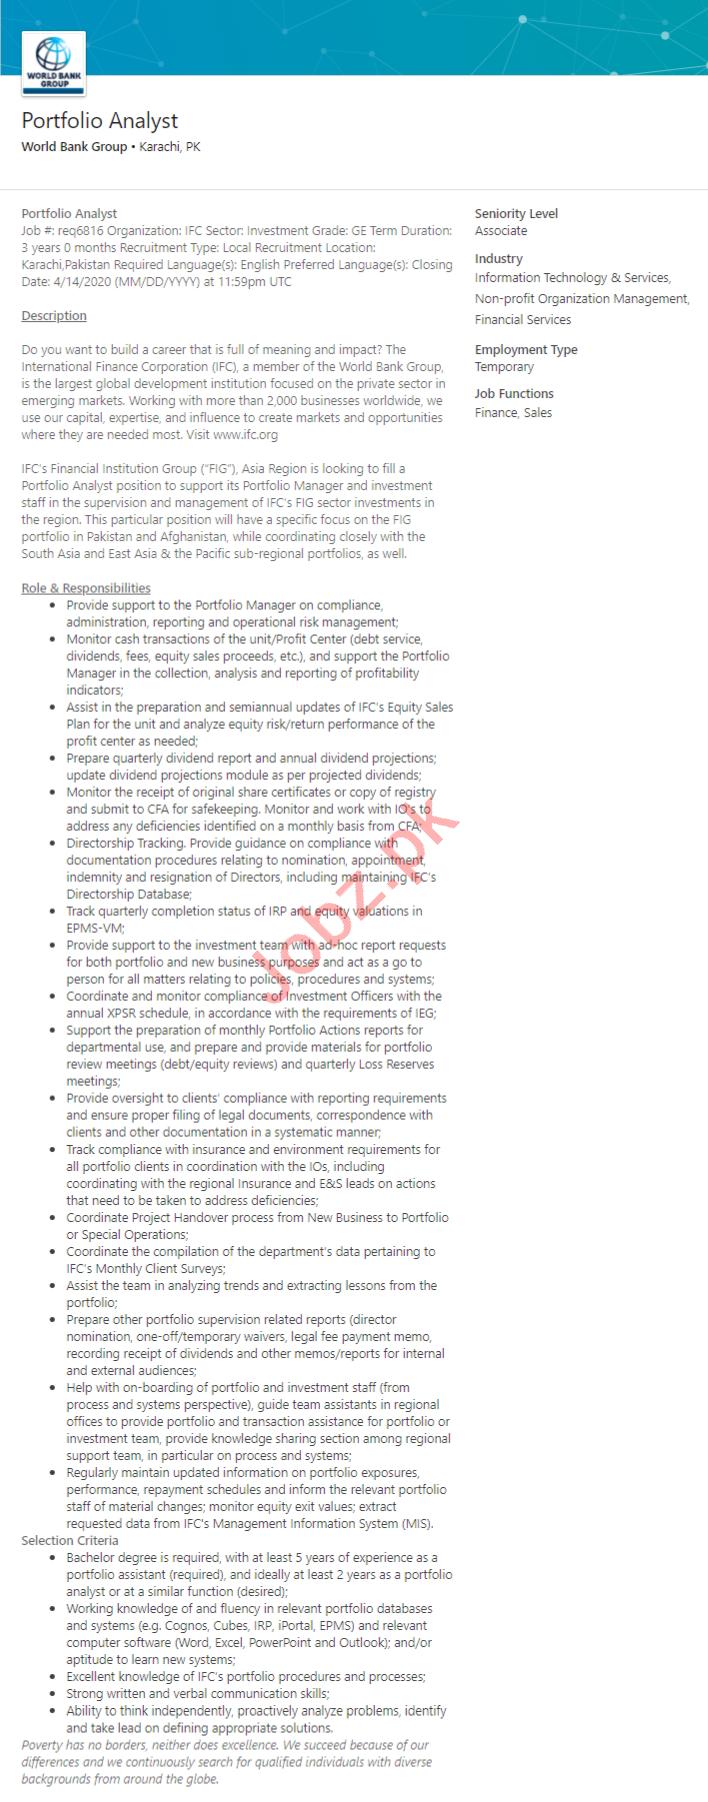 World Bank Group Karachi Jobs 2020 for Portfolio Analyst